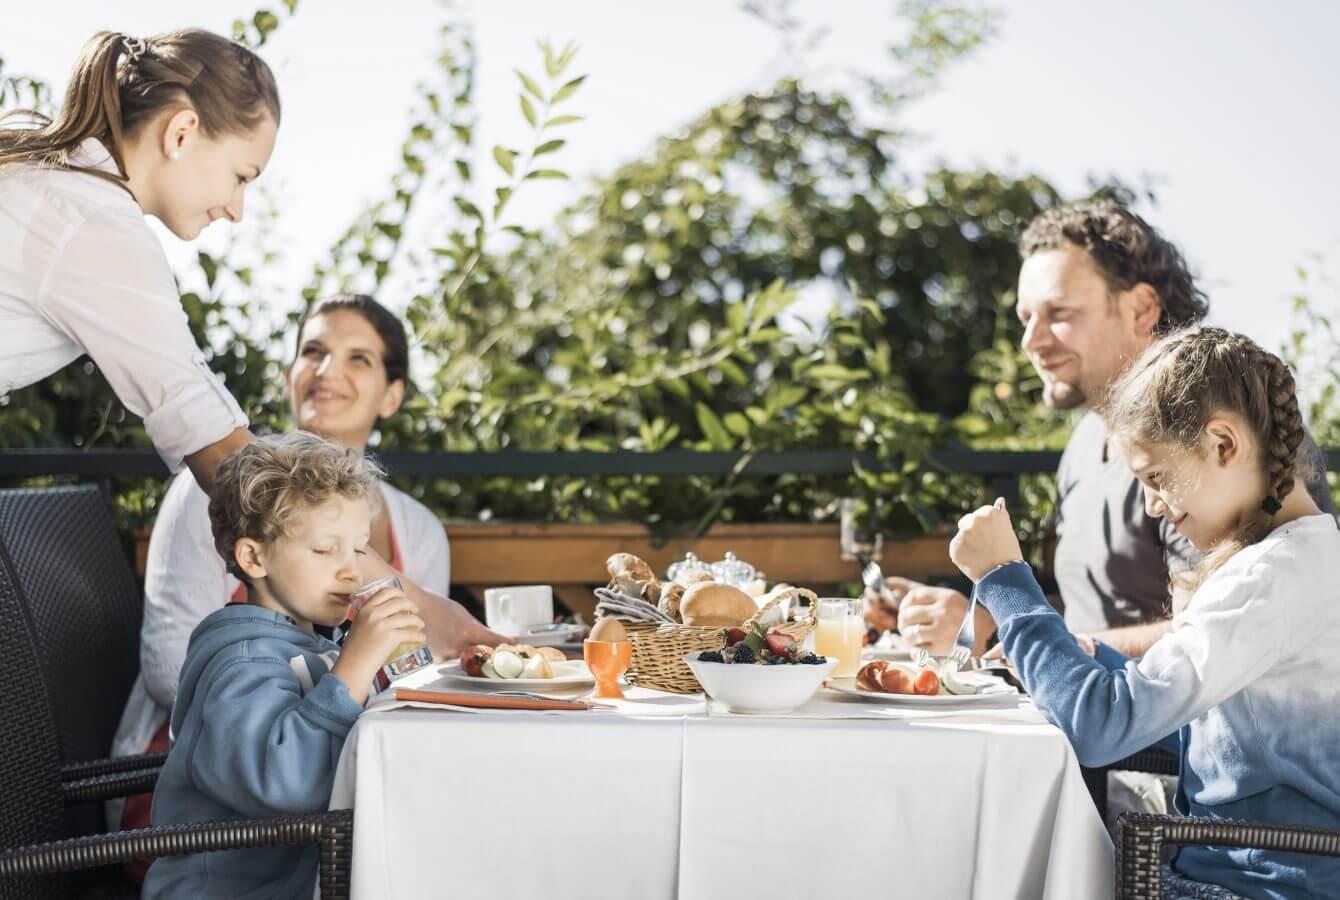 Familie, Frühstück